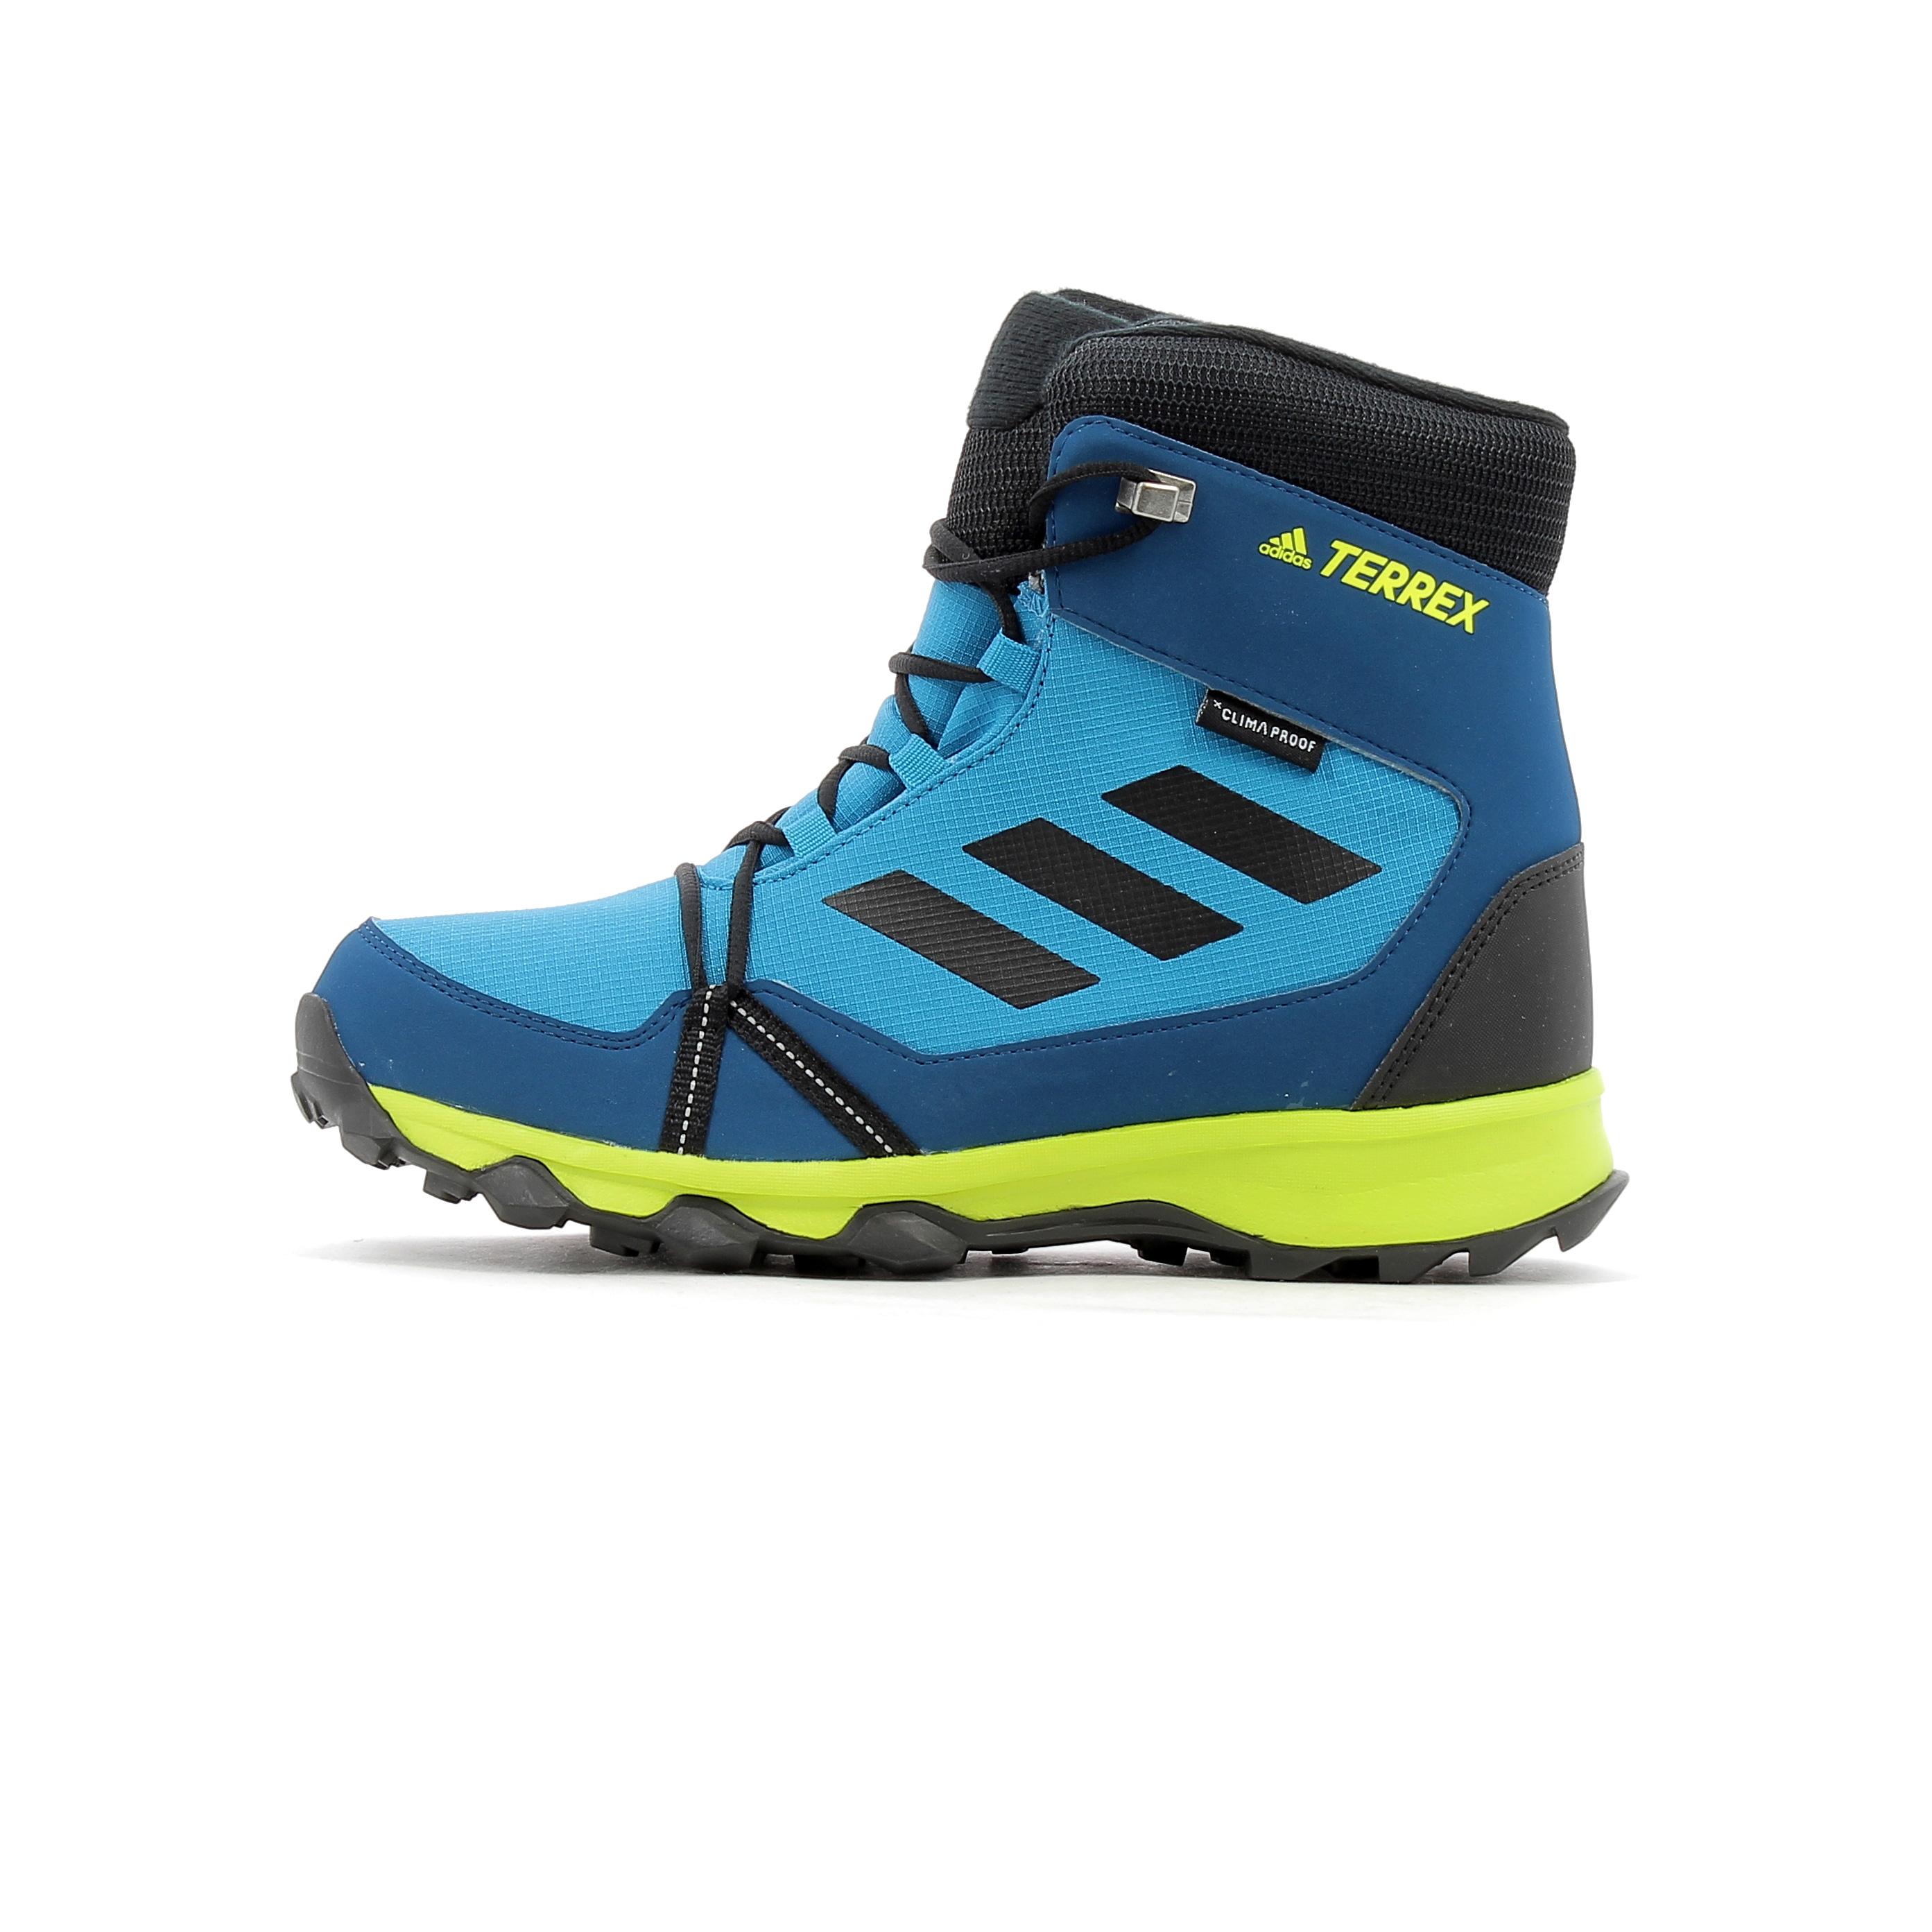 (enfant) Adidas Chaussures de randonnée Terrex Snow CP CW Junior kKVGt